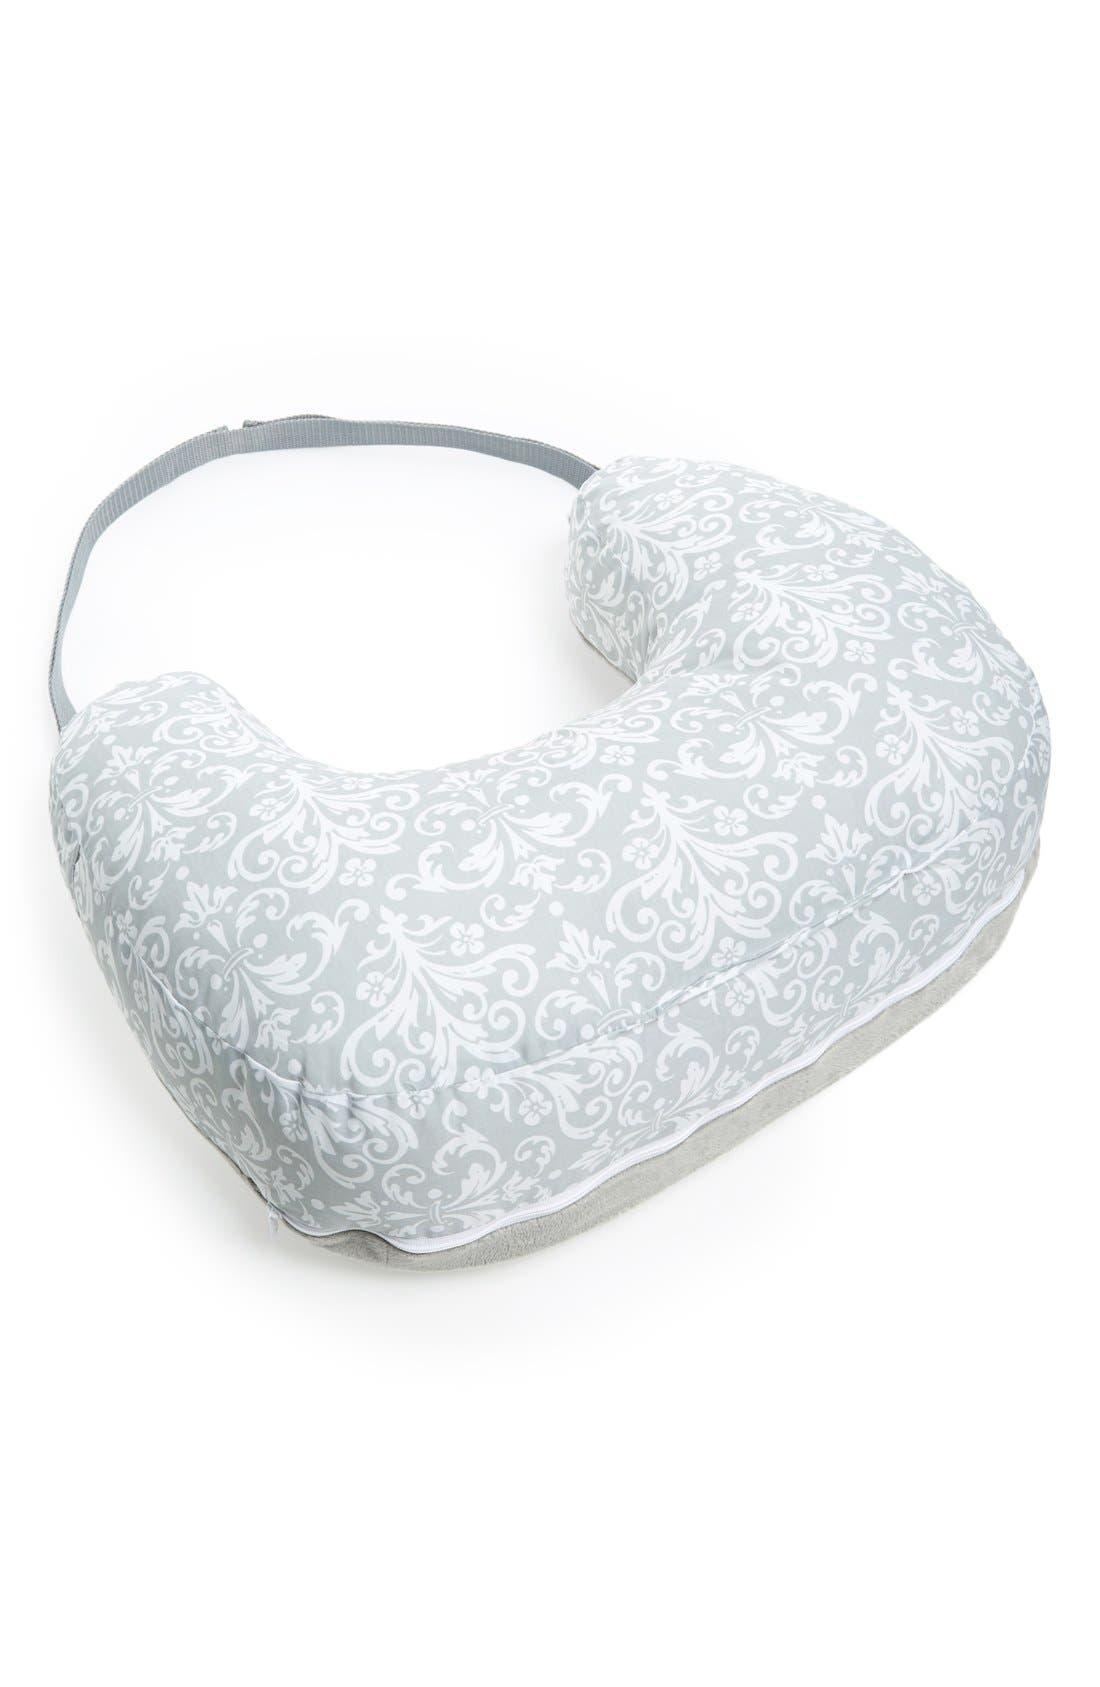 Two Sided Breastfeeding Pillow & Slipcover,                             Main thumbnail 1, color,                             Kensington Grey